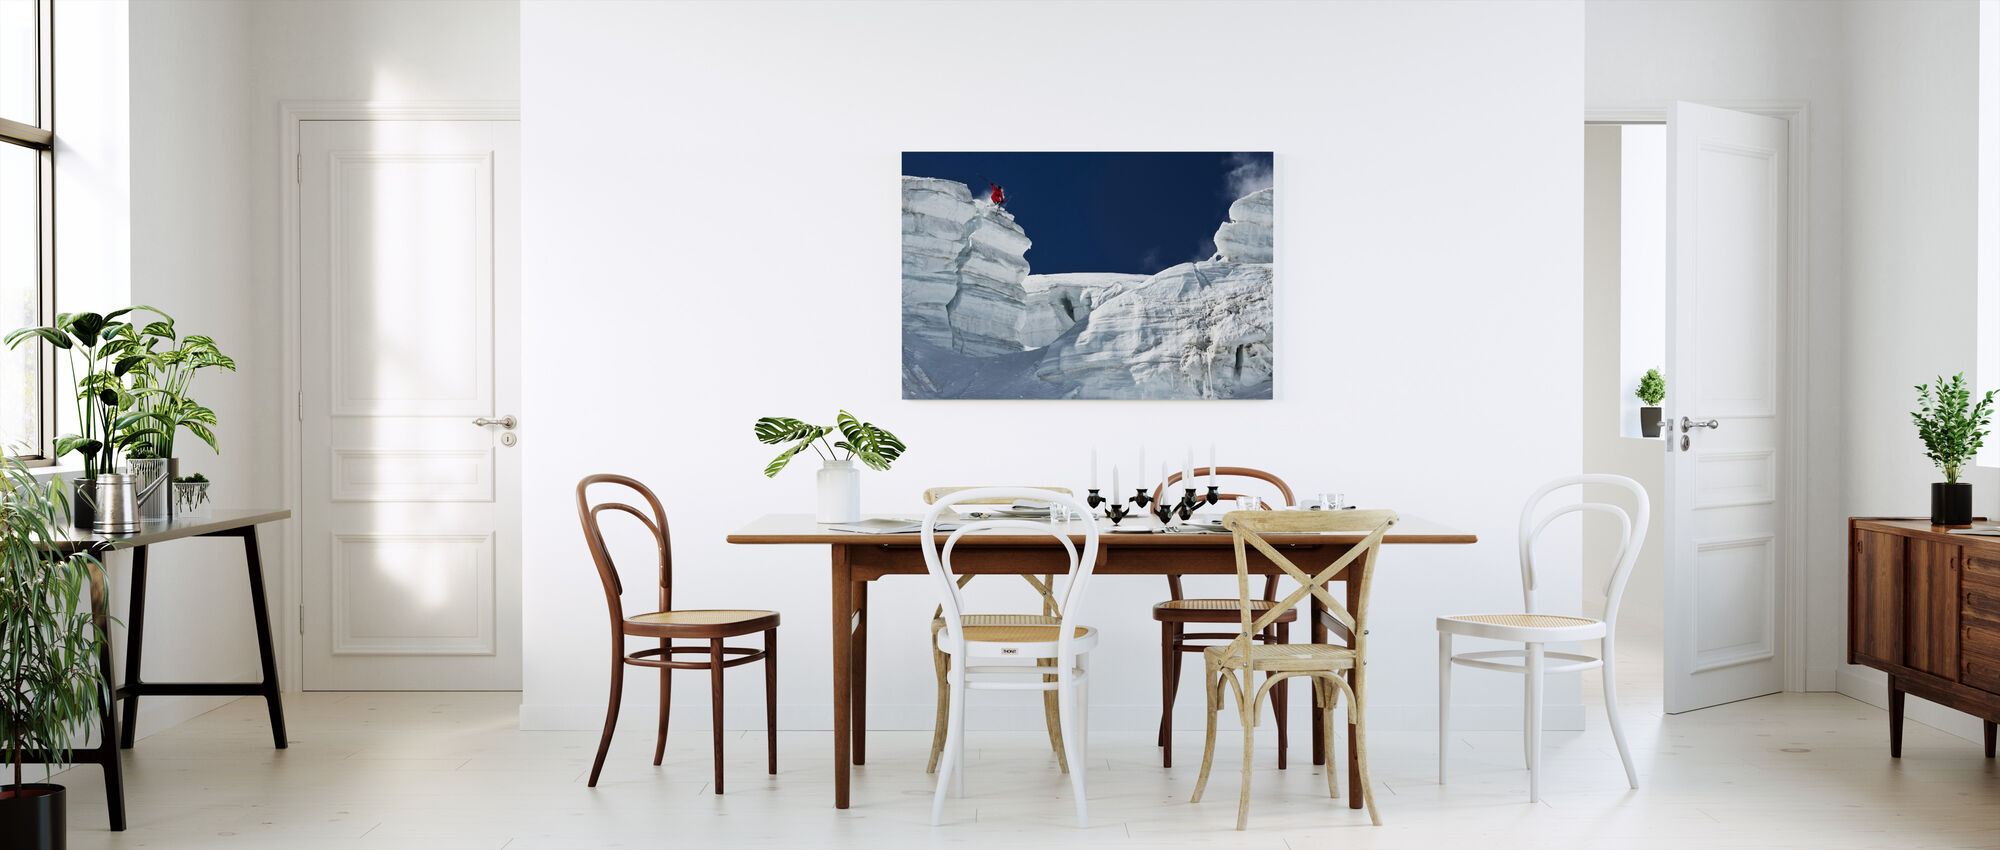 Cliff Jumping - Canvas print - Kitchen